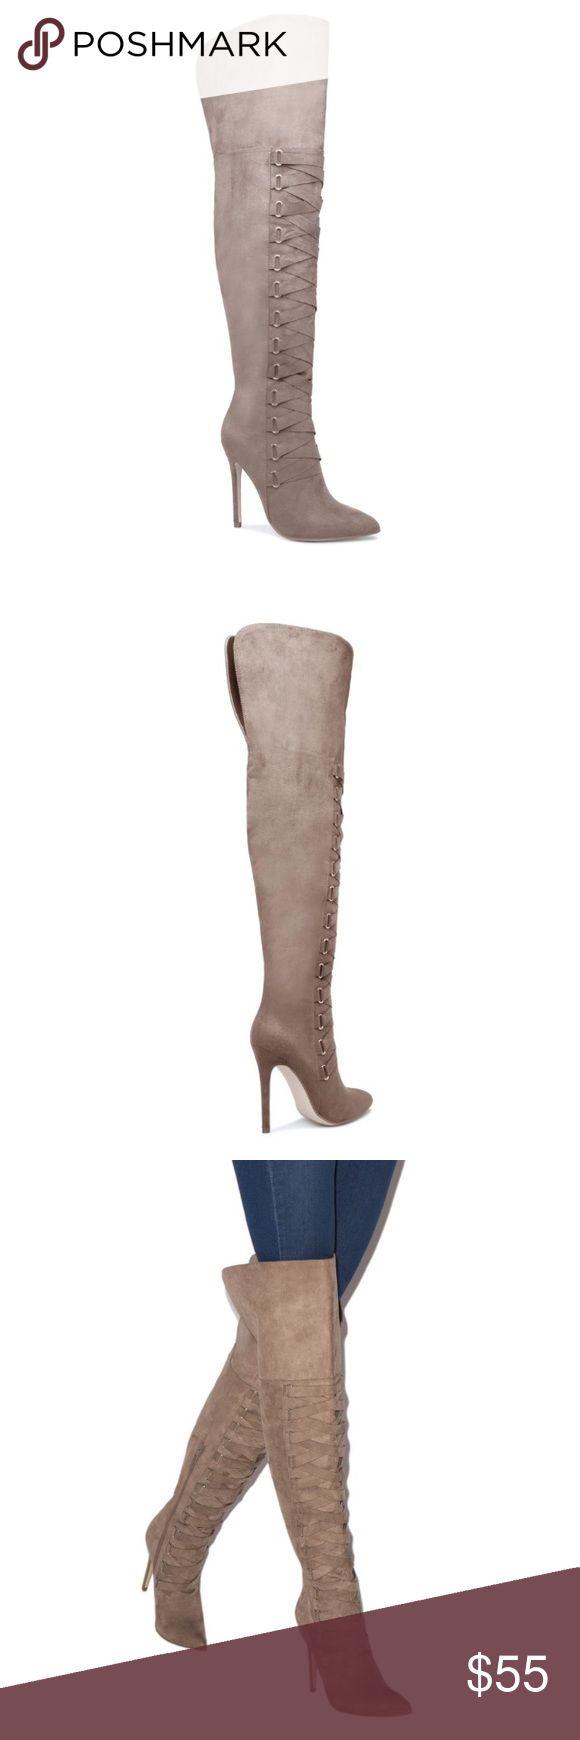 NWT Size 10 Shoe Dazzle Taupe OTK Corset Boots NWT Size 10 Shoe Dazzle Faux Suede Taupe OTK Corset Boots. Shoe Dazzle Shoes Over the Knee Boots